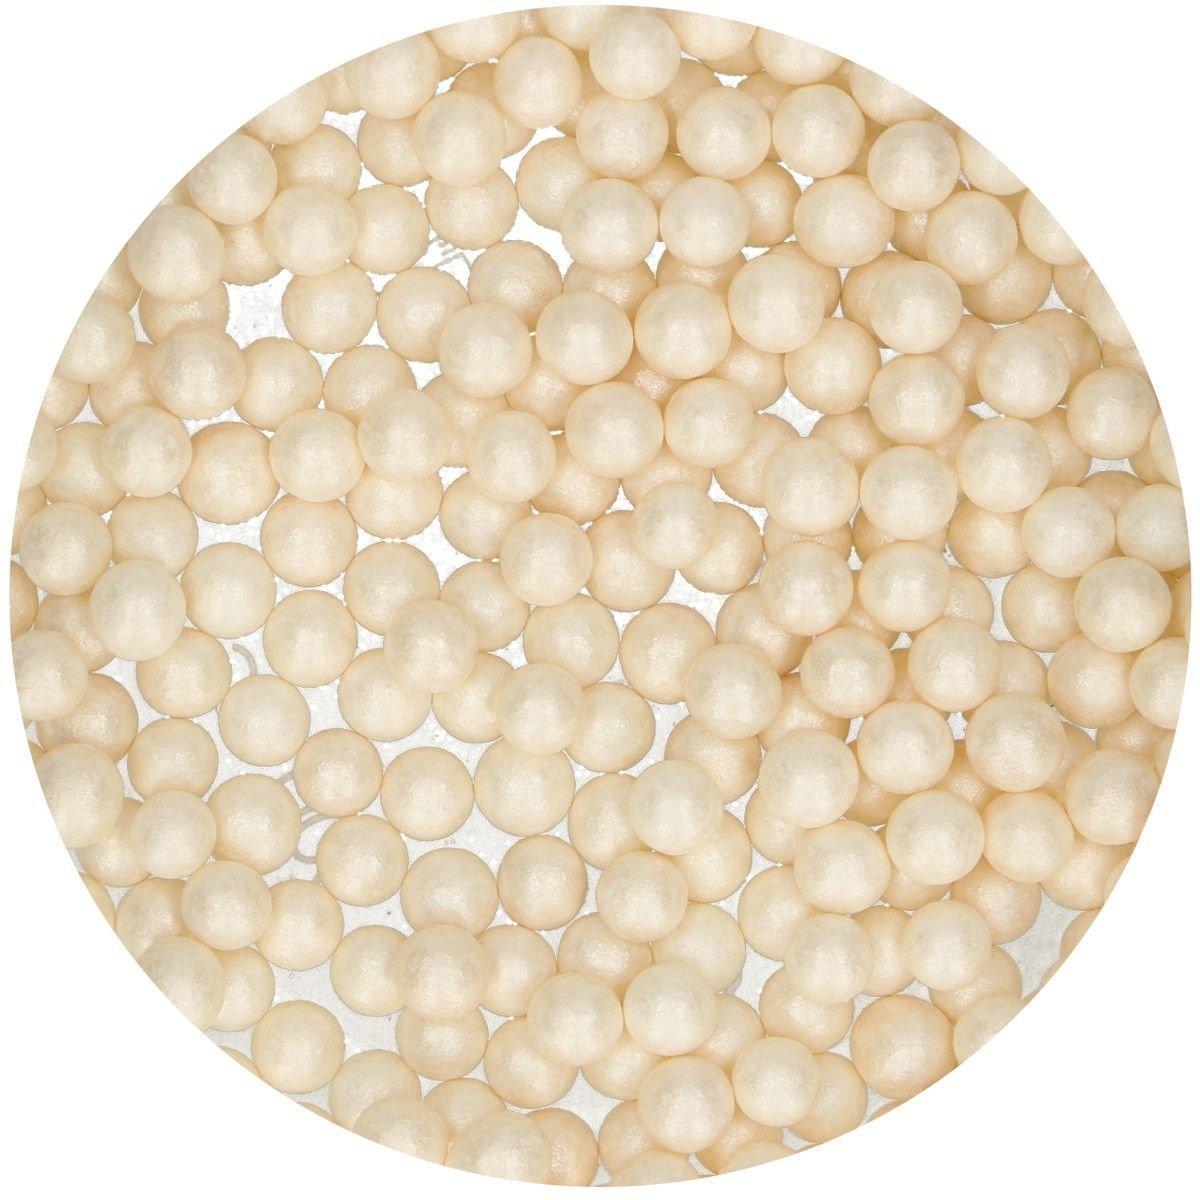 FunCakes Sugarballs -7mm WHITE MAXI 80g Μπιλίτσες Μεγάλες Λευκές